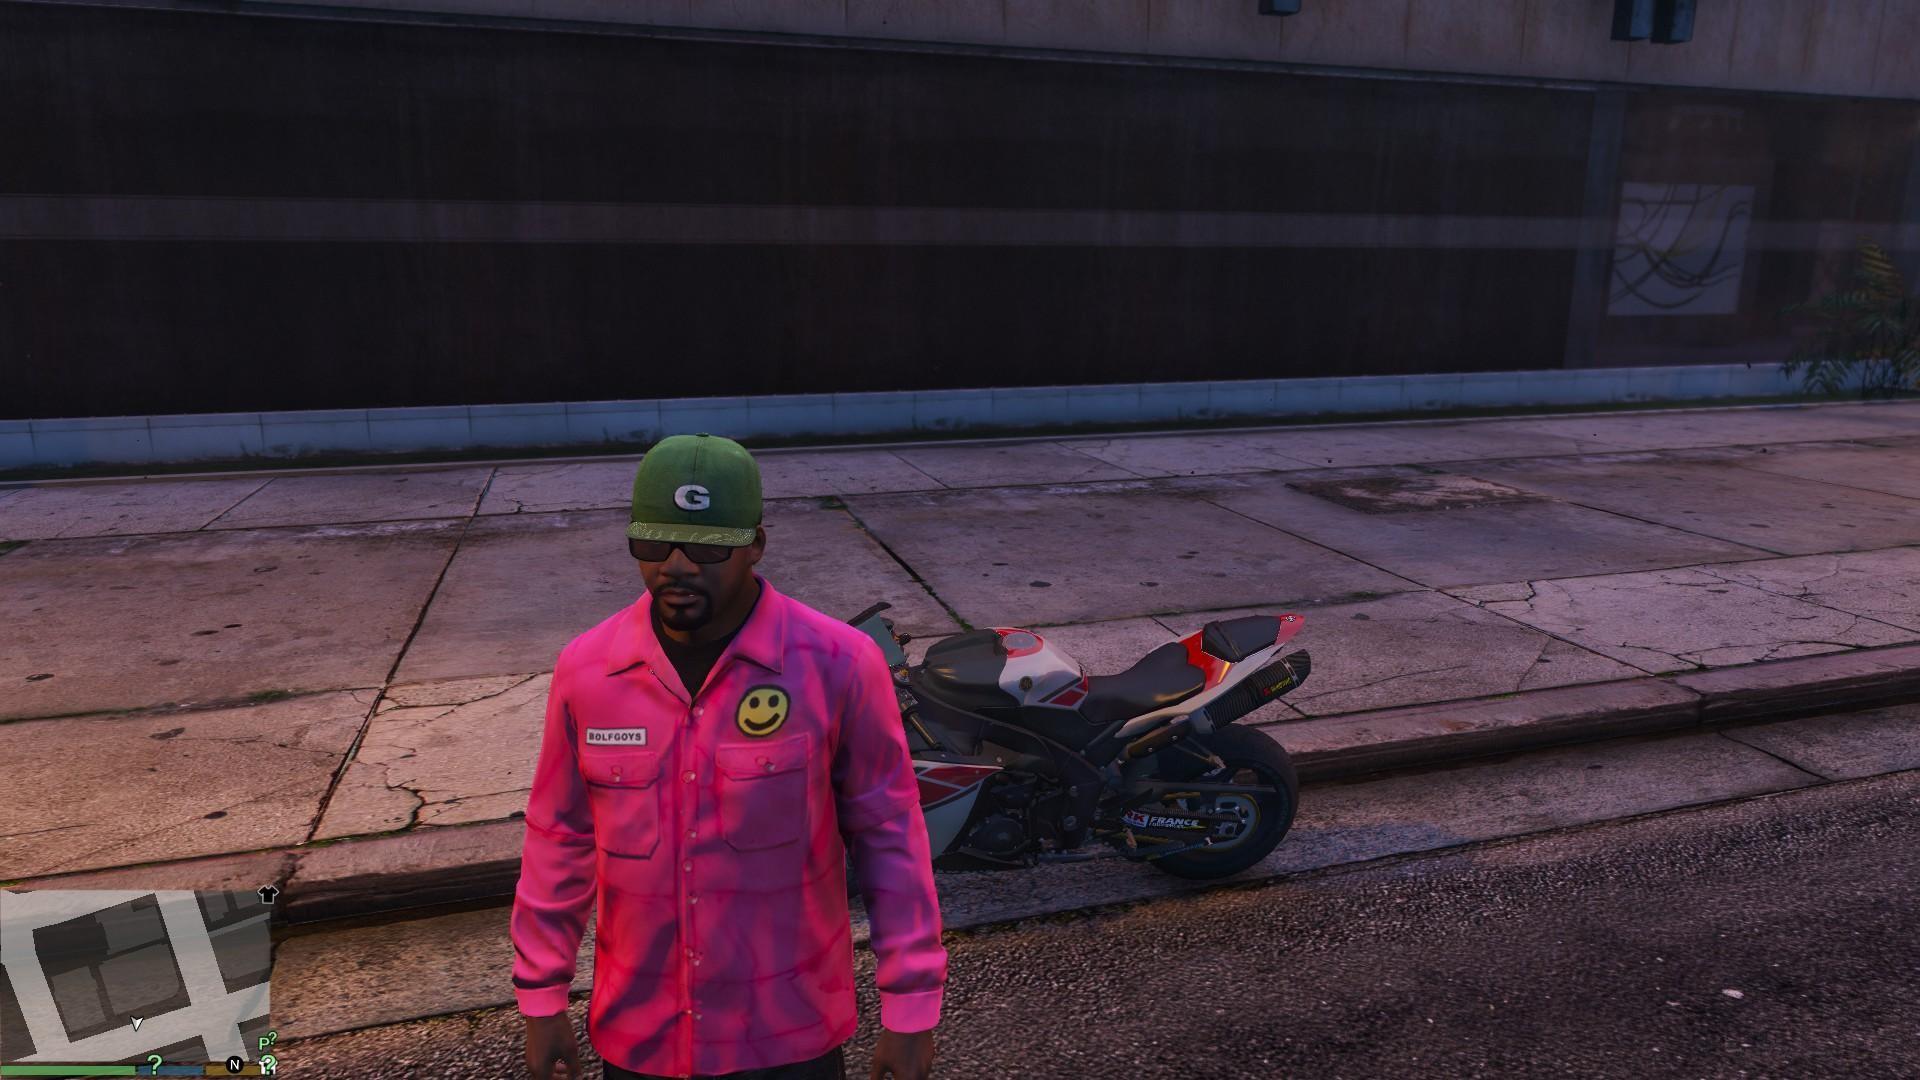 Bolf Goys Nylon Spring Slim Fit Jacket Pink (Golf Wang) – GTA5-Mods.com